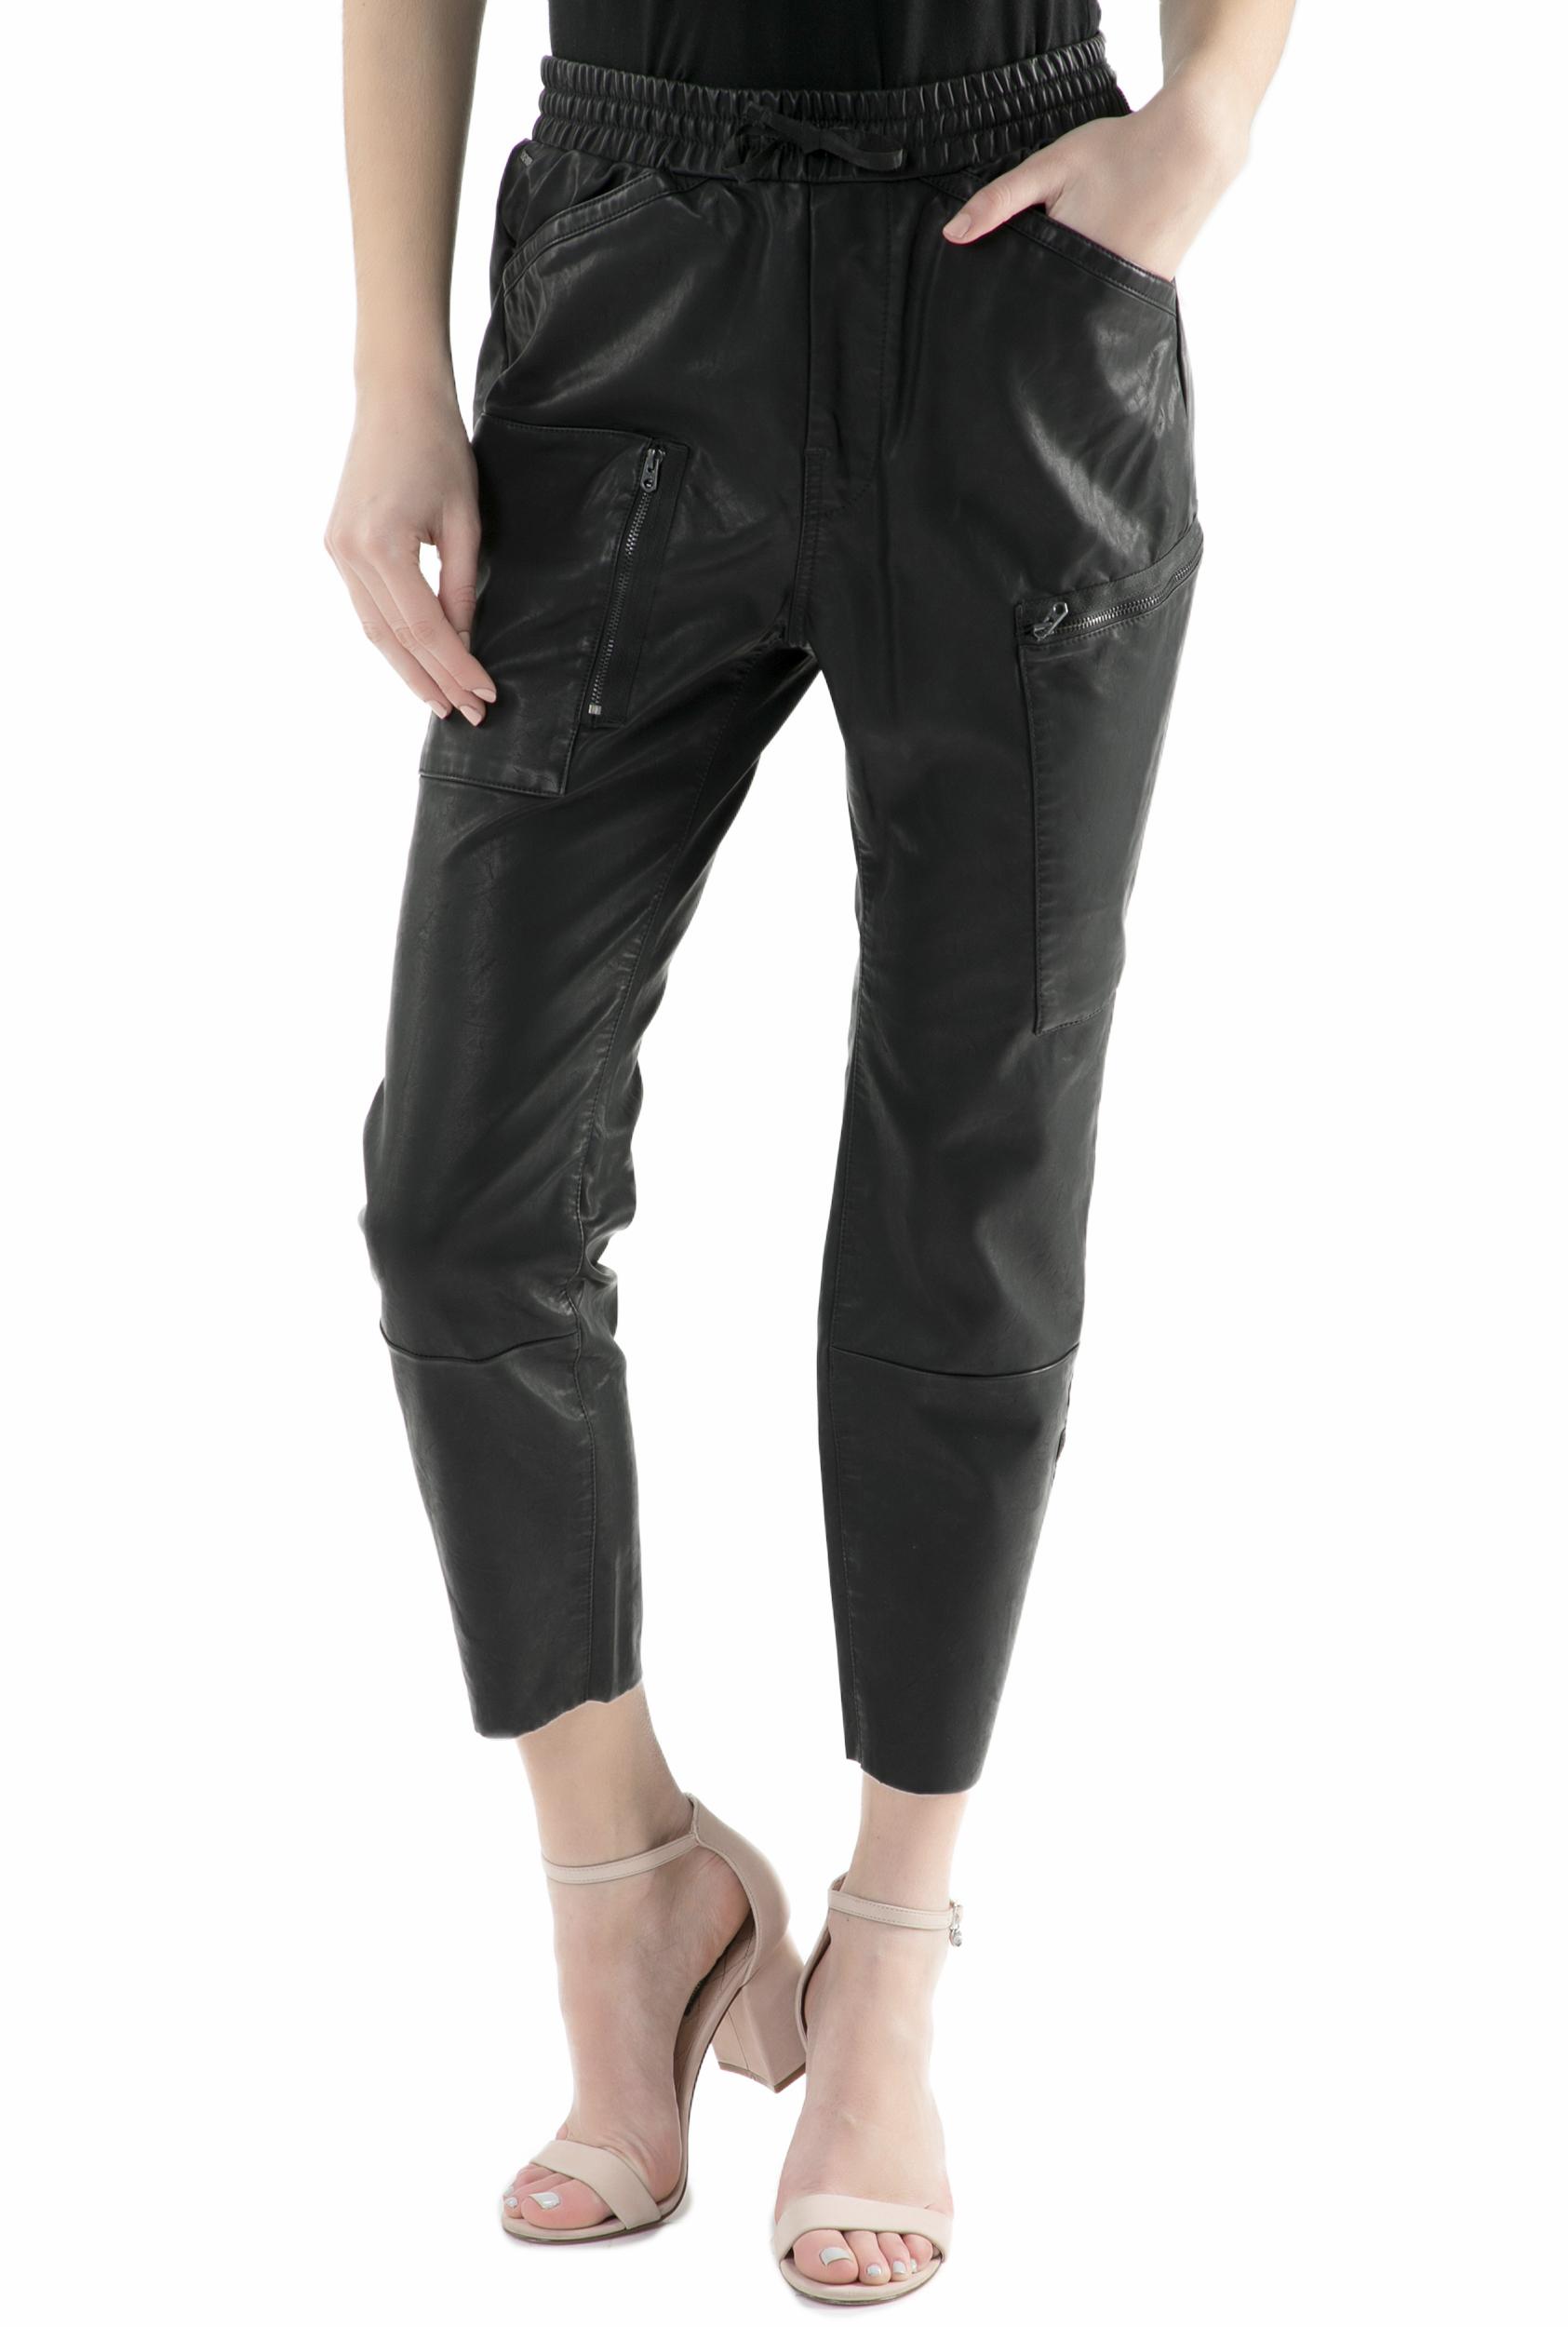 G-STAR RAW - Γυναικείο cropped παντελόνι G-Star Raw μαύρο